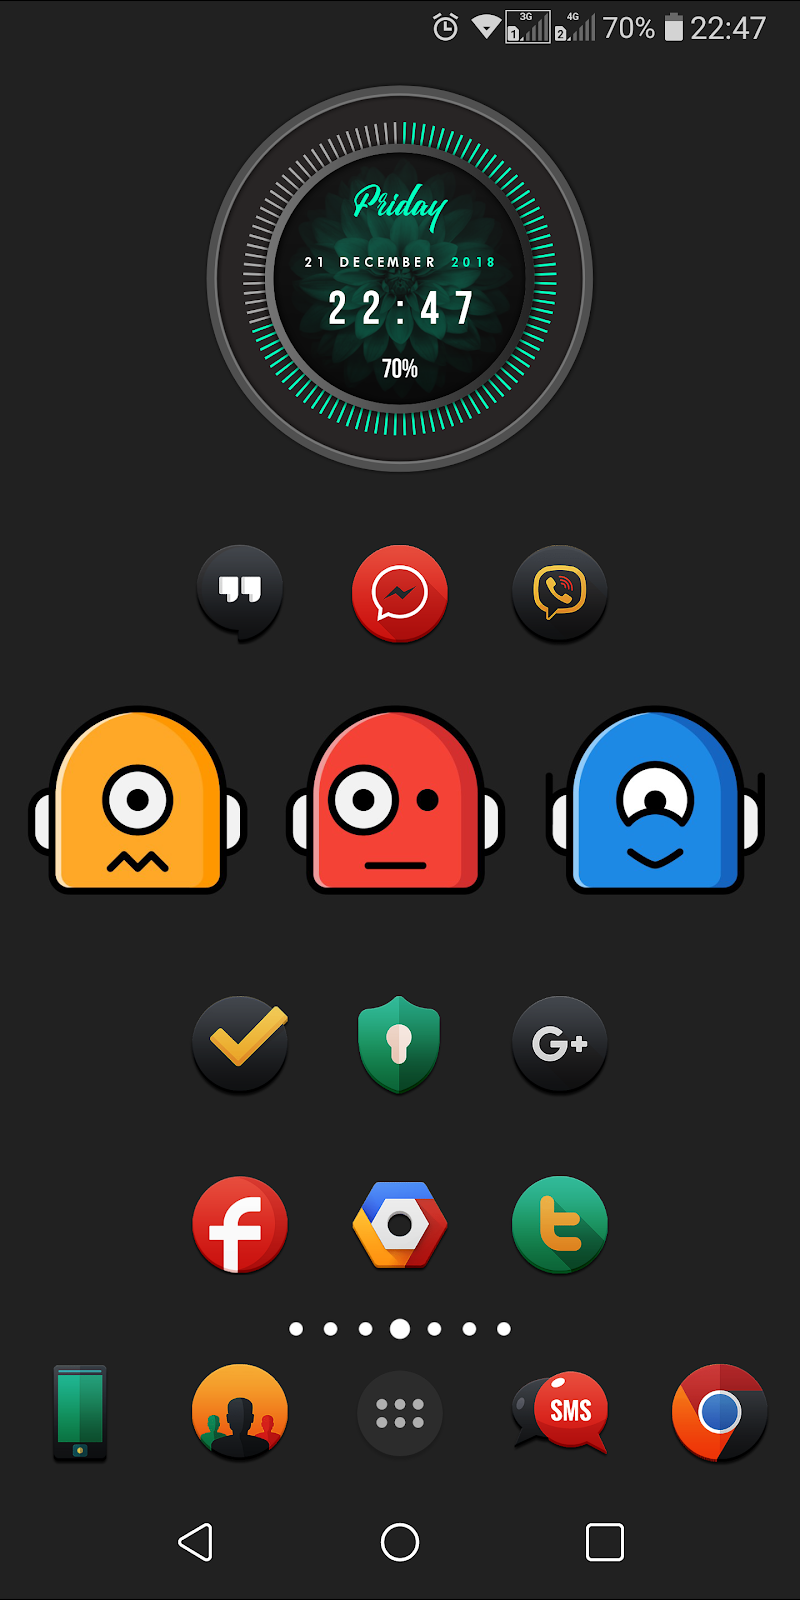 Darkonis - Icon Pack Screenshot 2